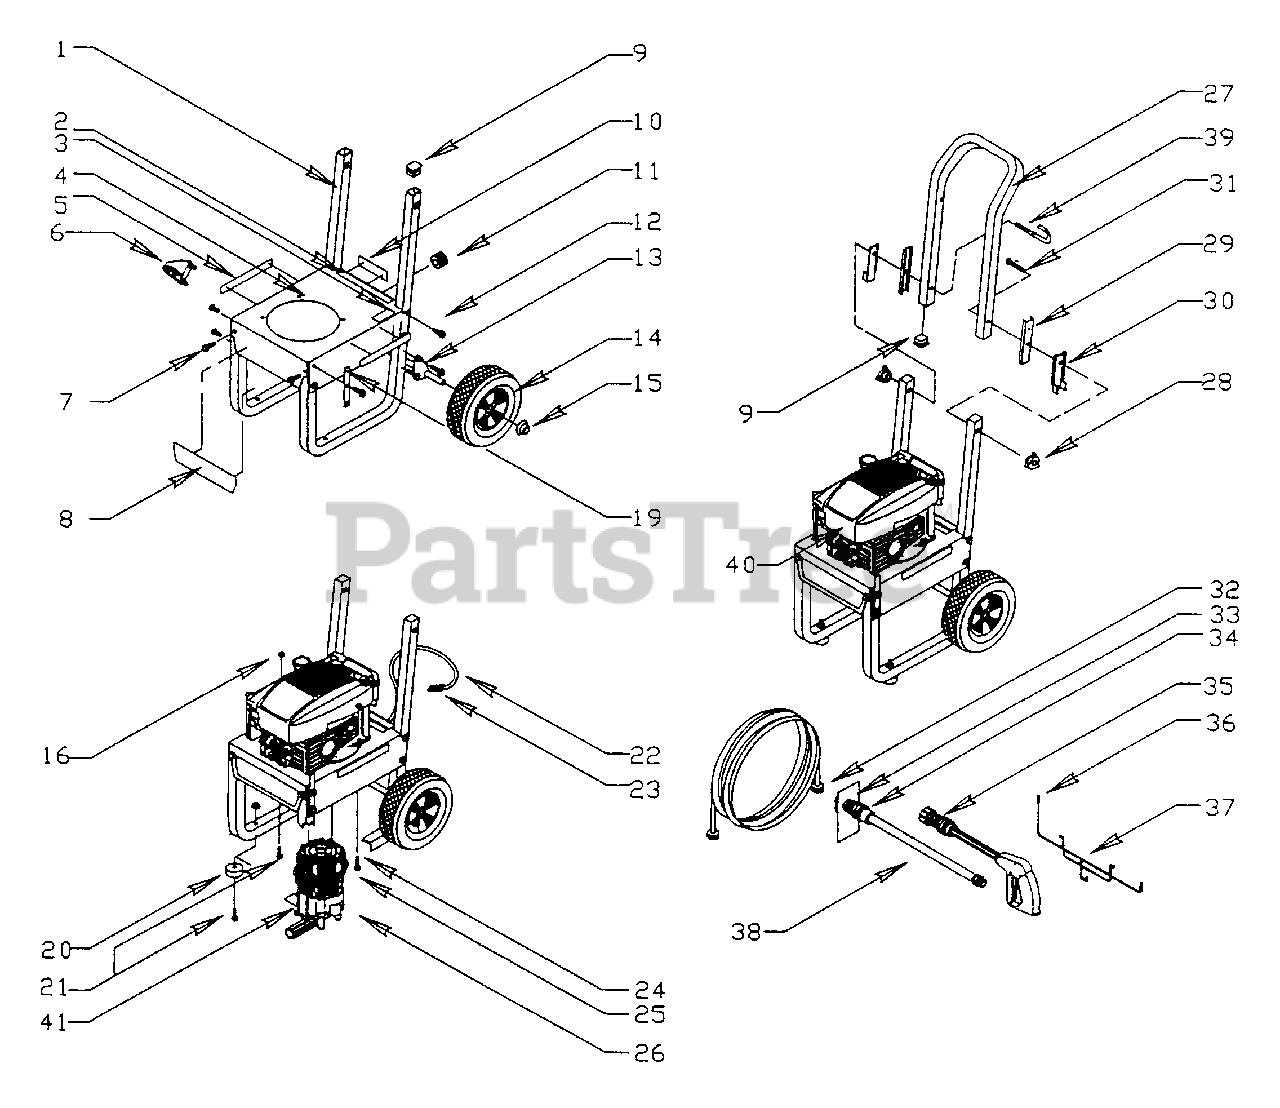 Craftsman 580 0